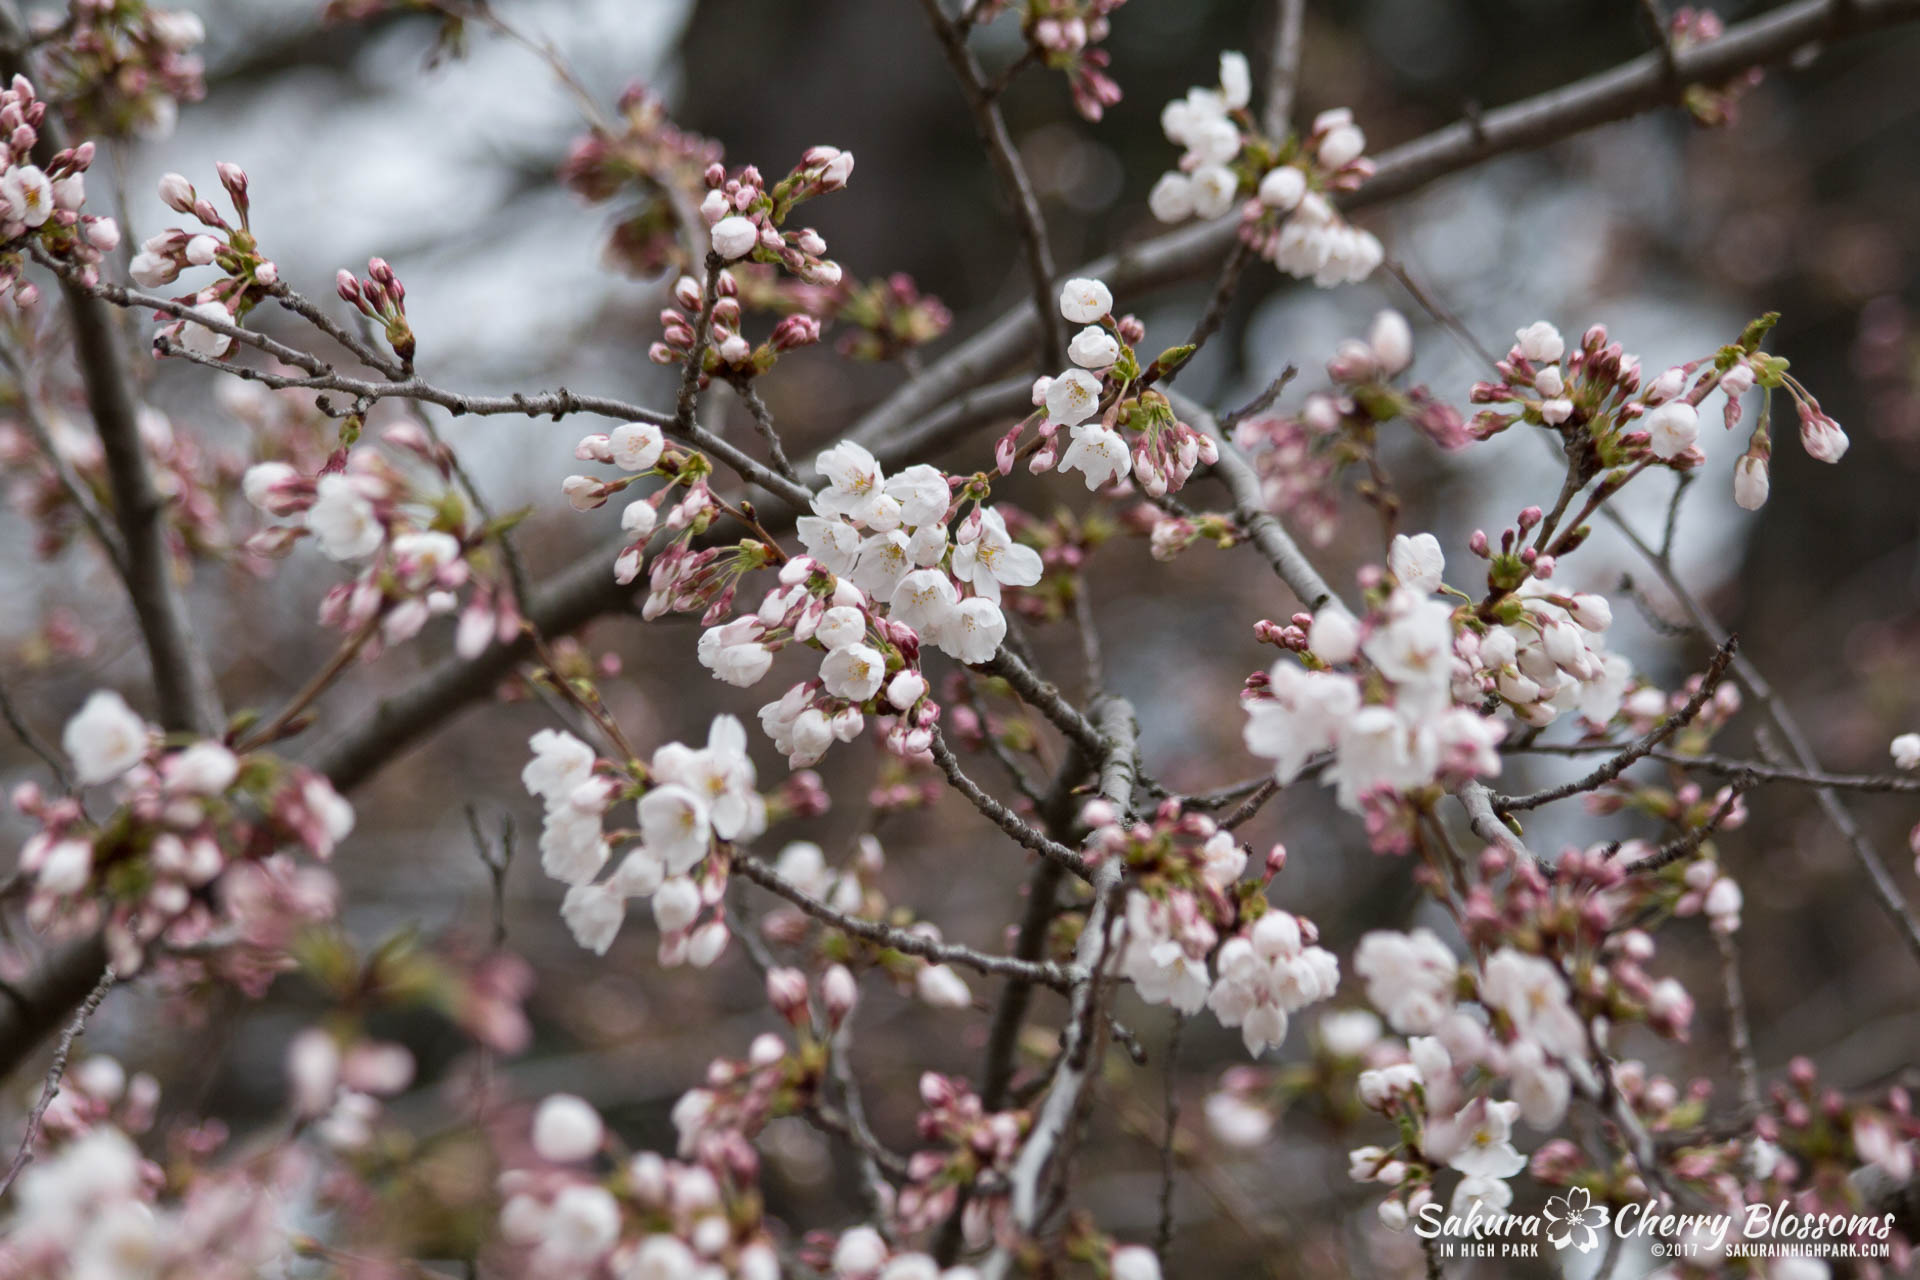 Sakura-Watch-April-21-2017-bloom-still-in-early-stages-23.jpg